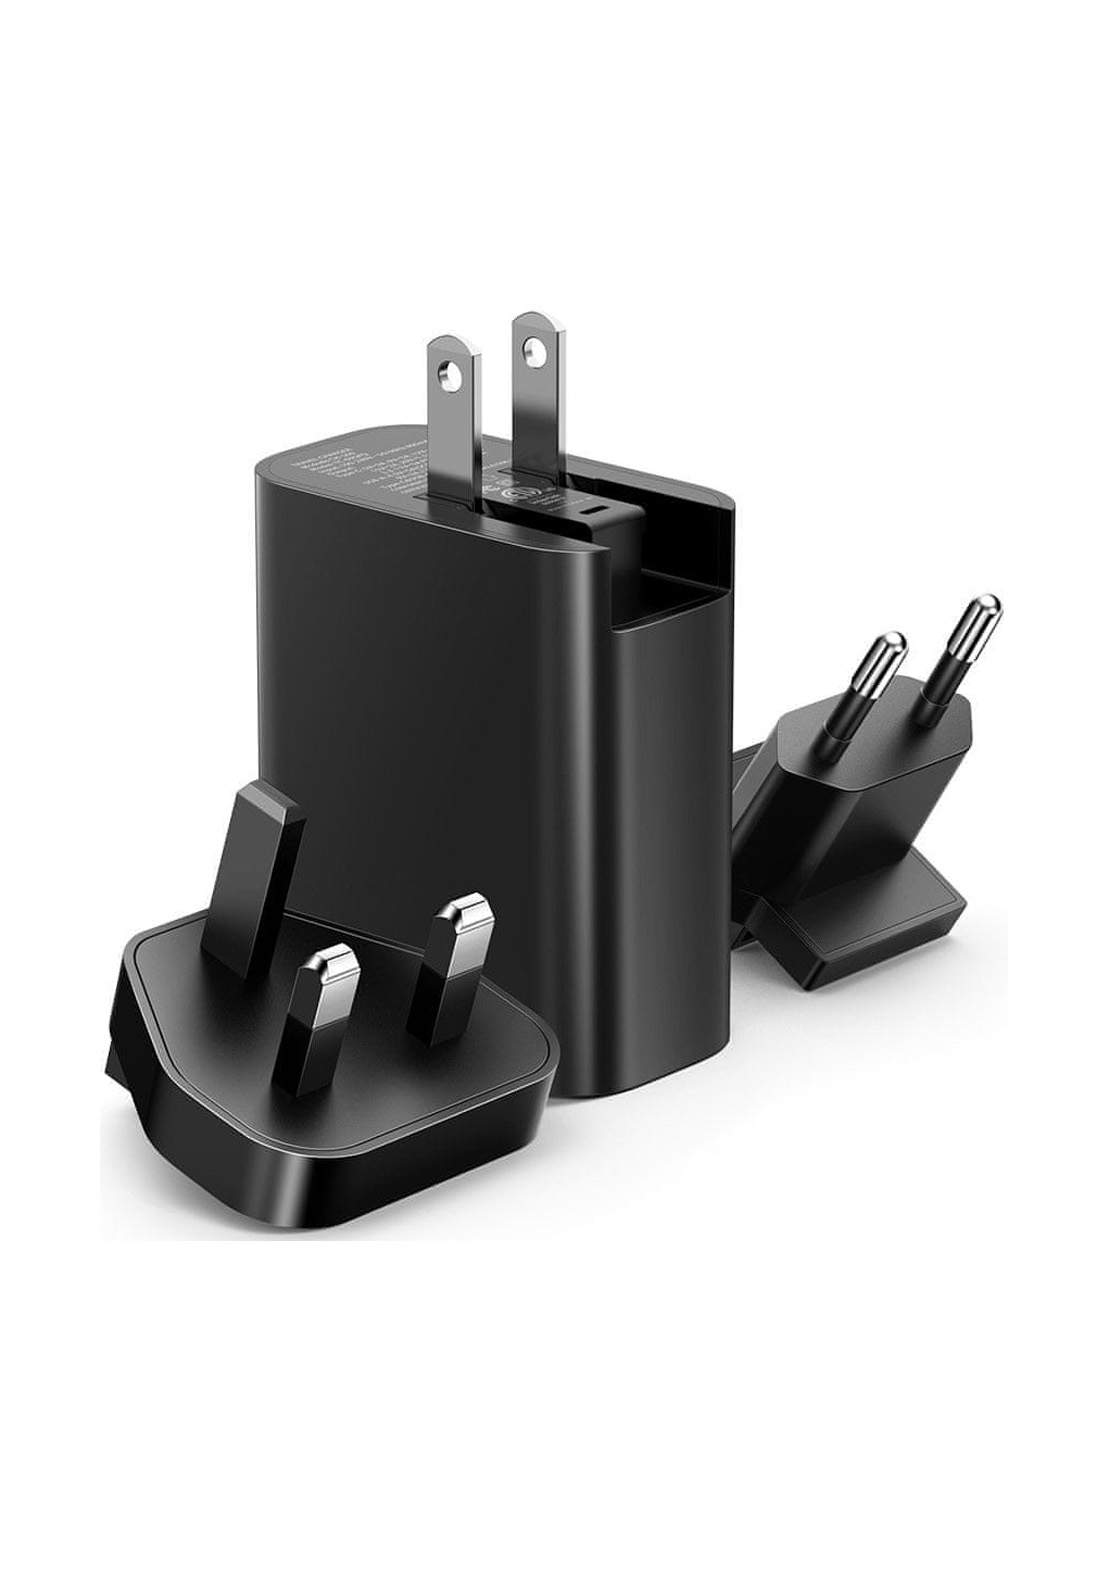 (4171)Mcdodo CH05601 Dual Ports USB Wall Charger (EU/UK/US) Plug - Black  شاحن